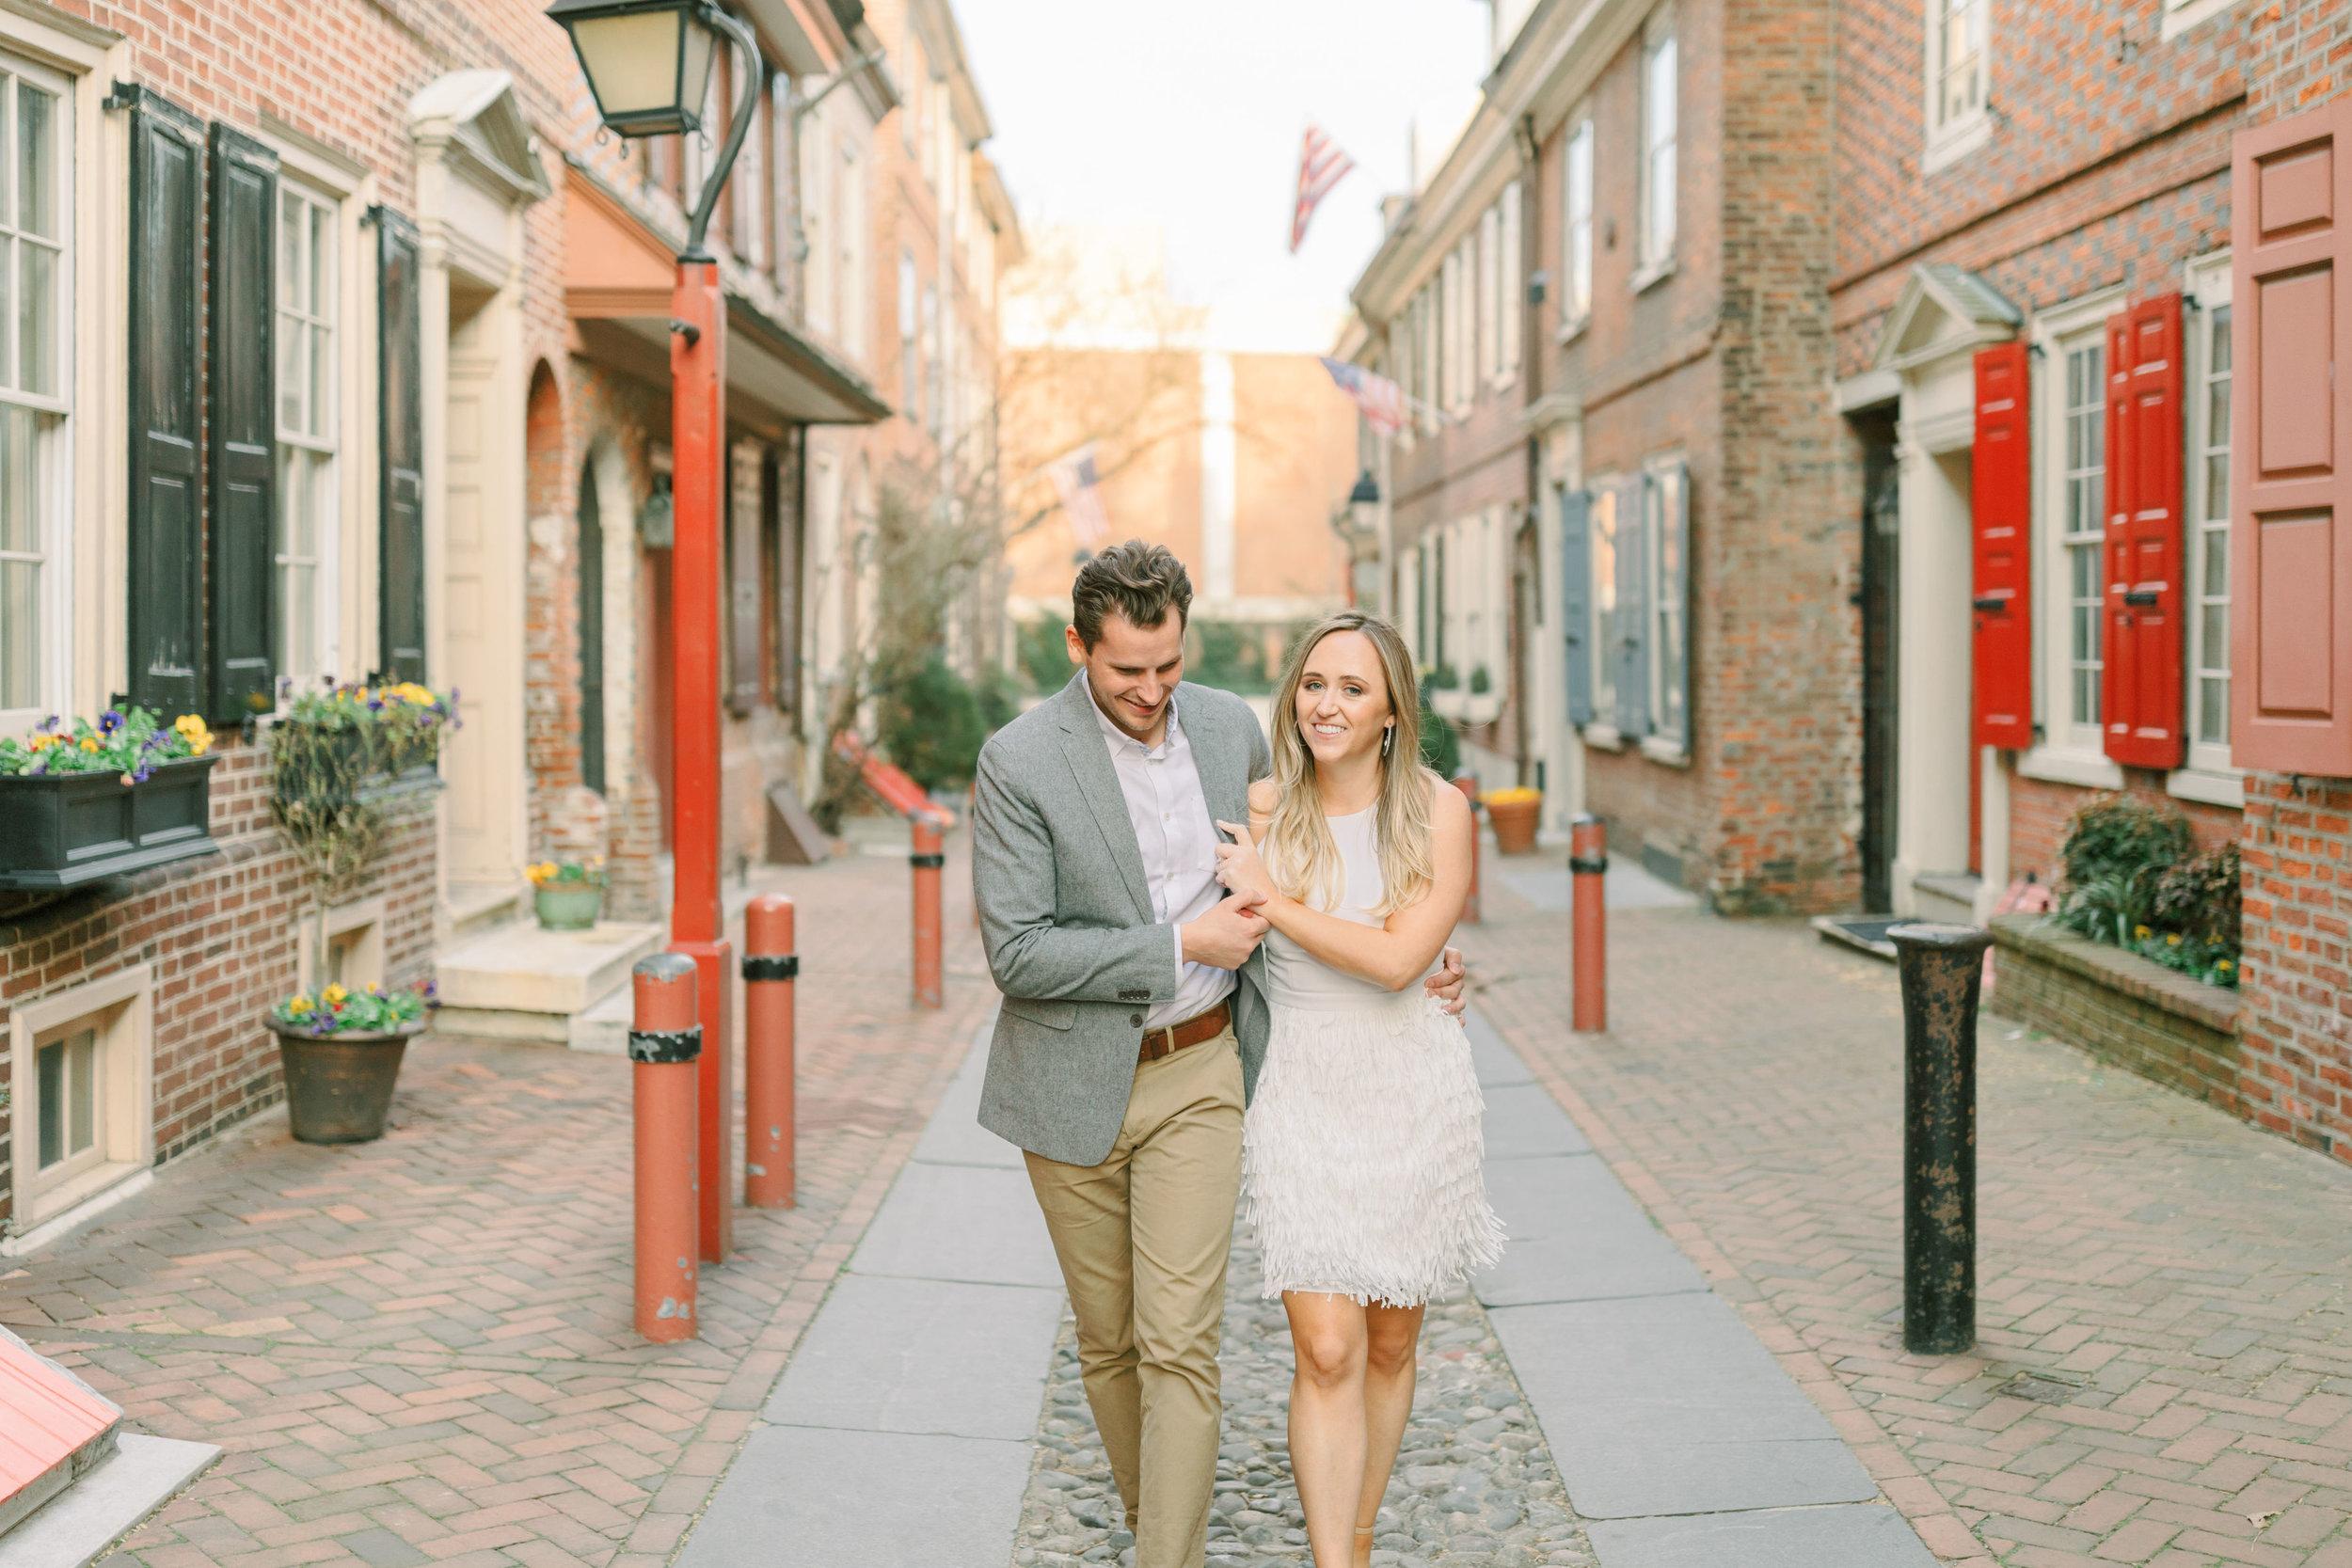 Brianne+SteveEngaged_Salt+CedarPhotography0071.jpg